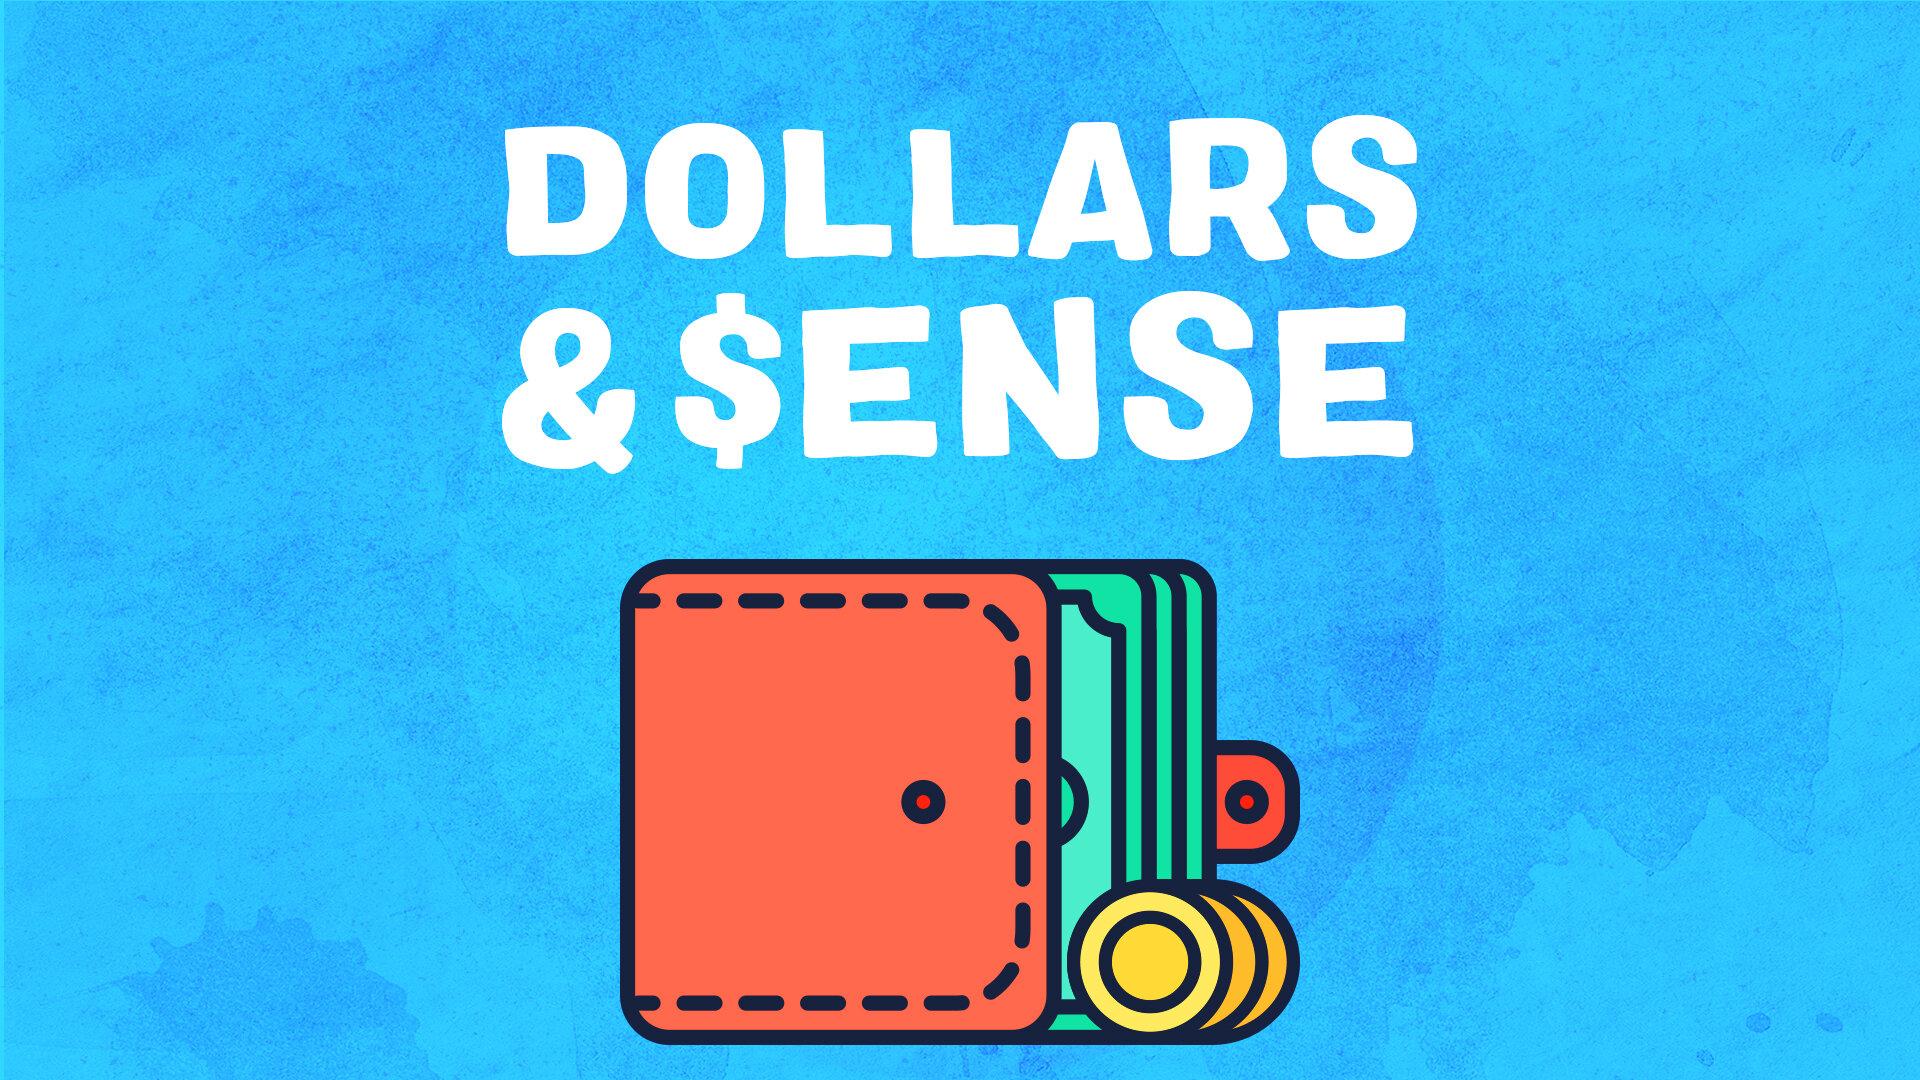 Dollars and Sense Money-Title.jpg